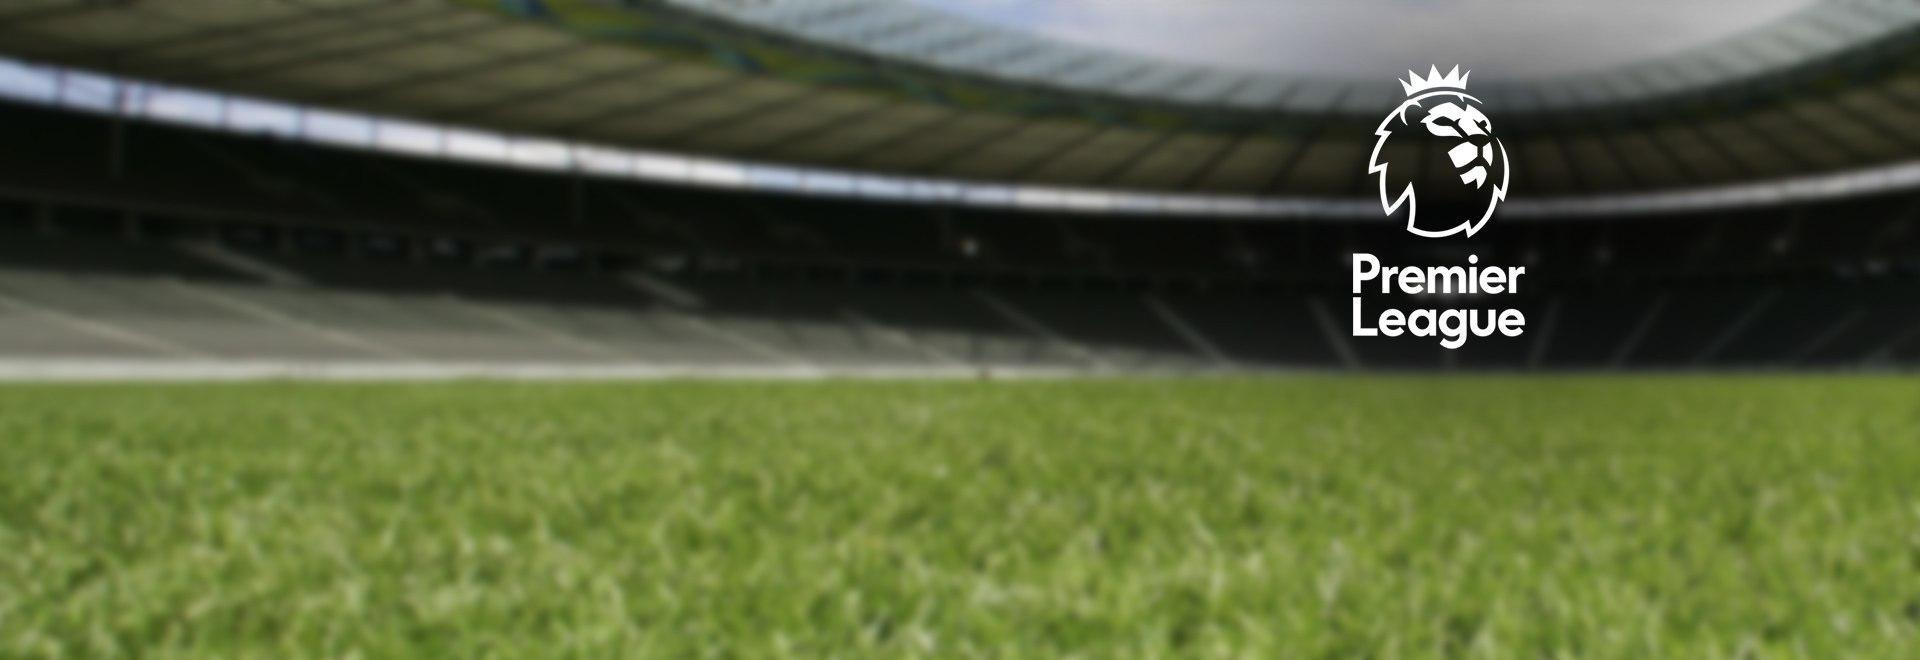 Fulham - Everton. 9a g.